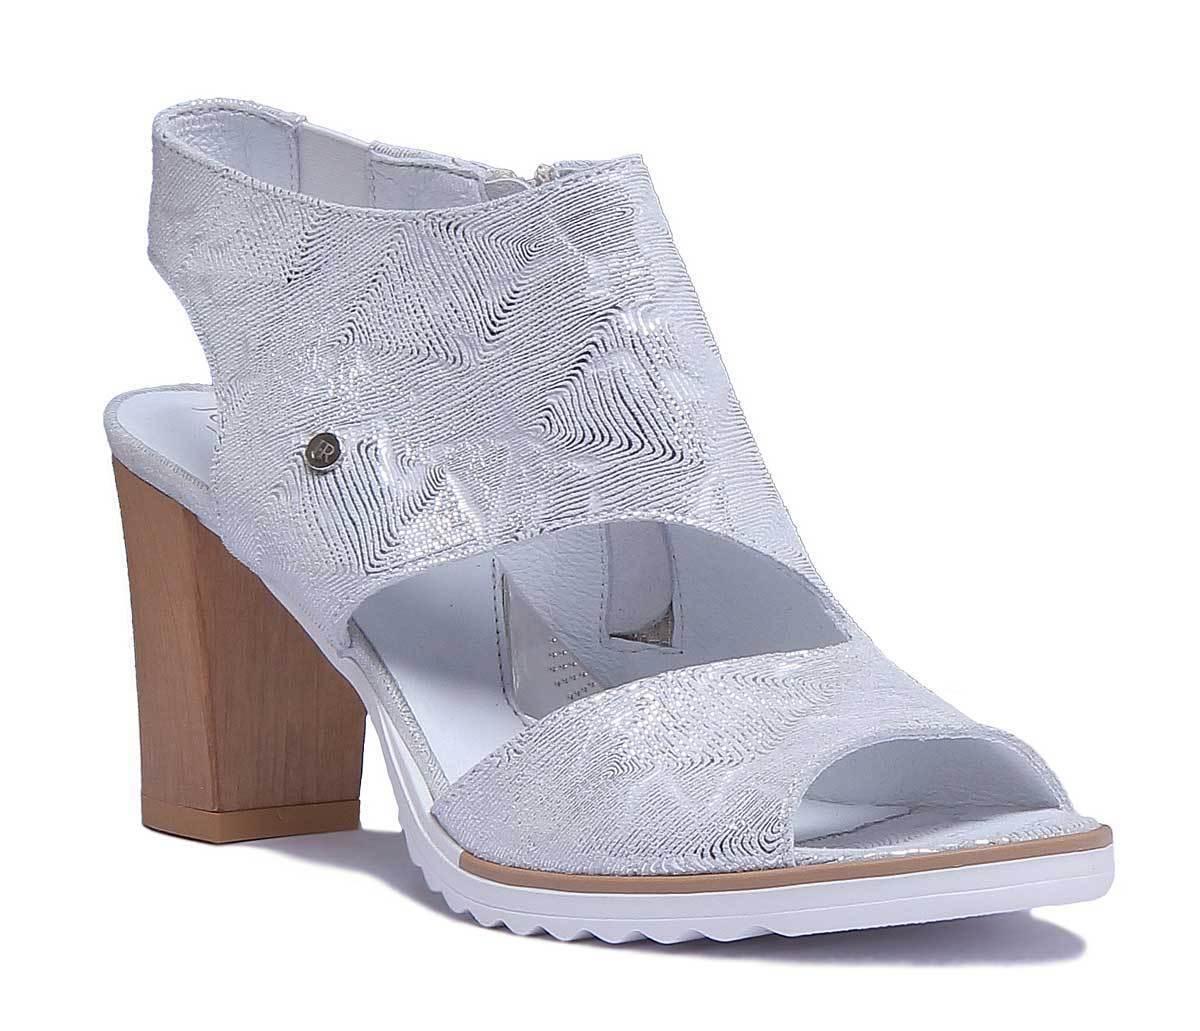 Justin Reece Peep Toe High Heel Textured Textured Textured Leather HIgh Heel Sandal Size UK 3 - 8 449fe8